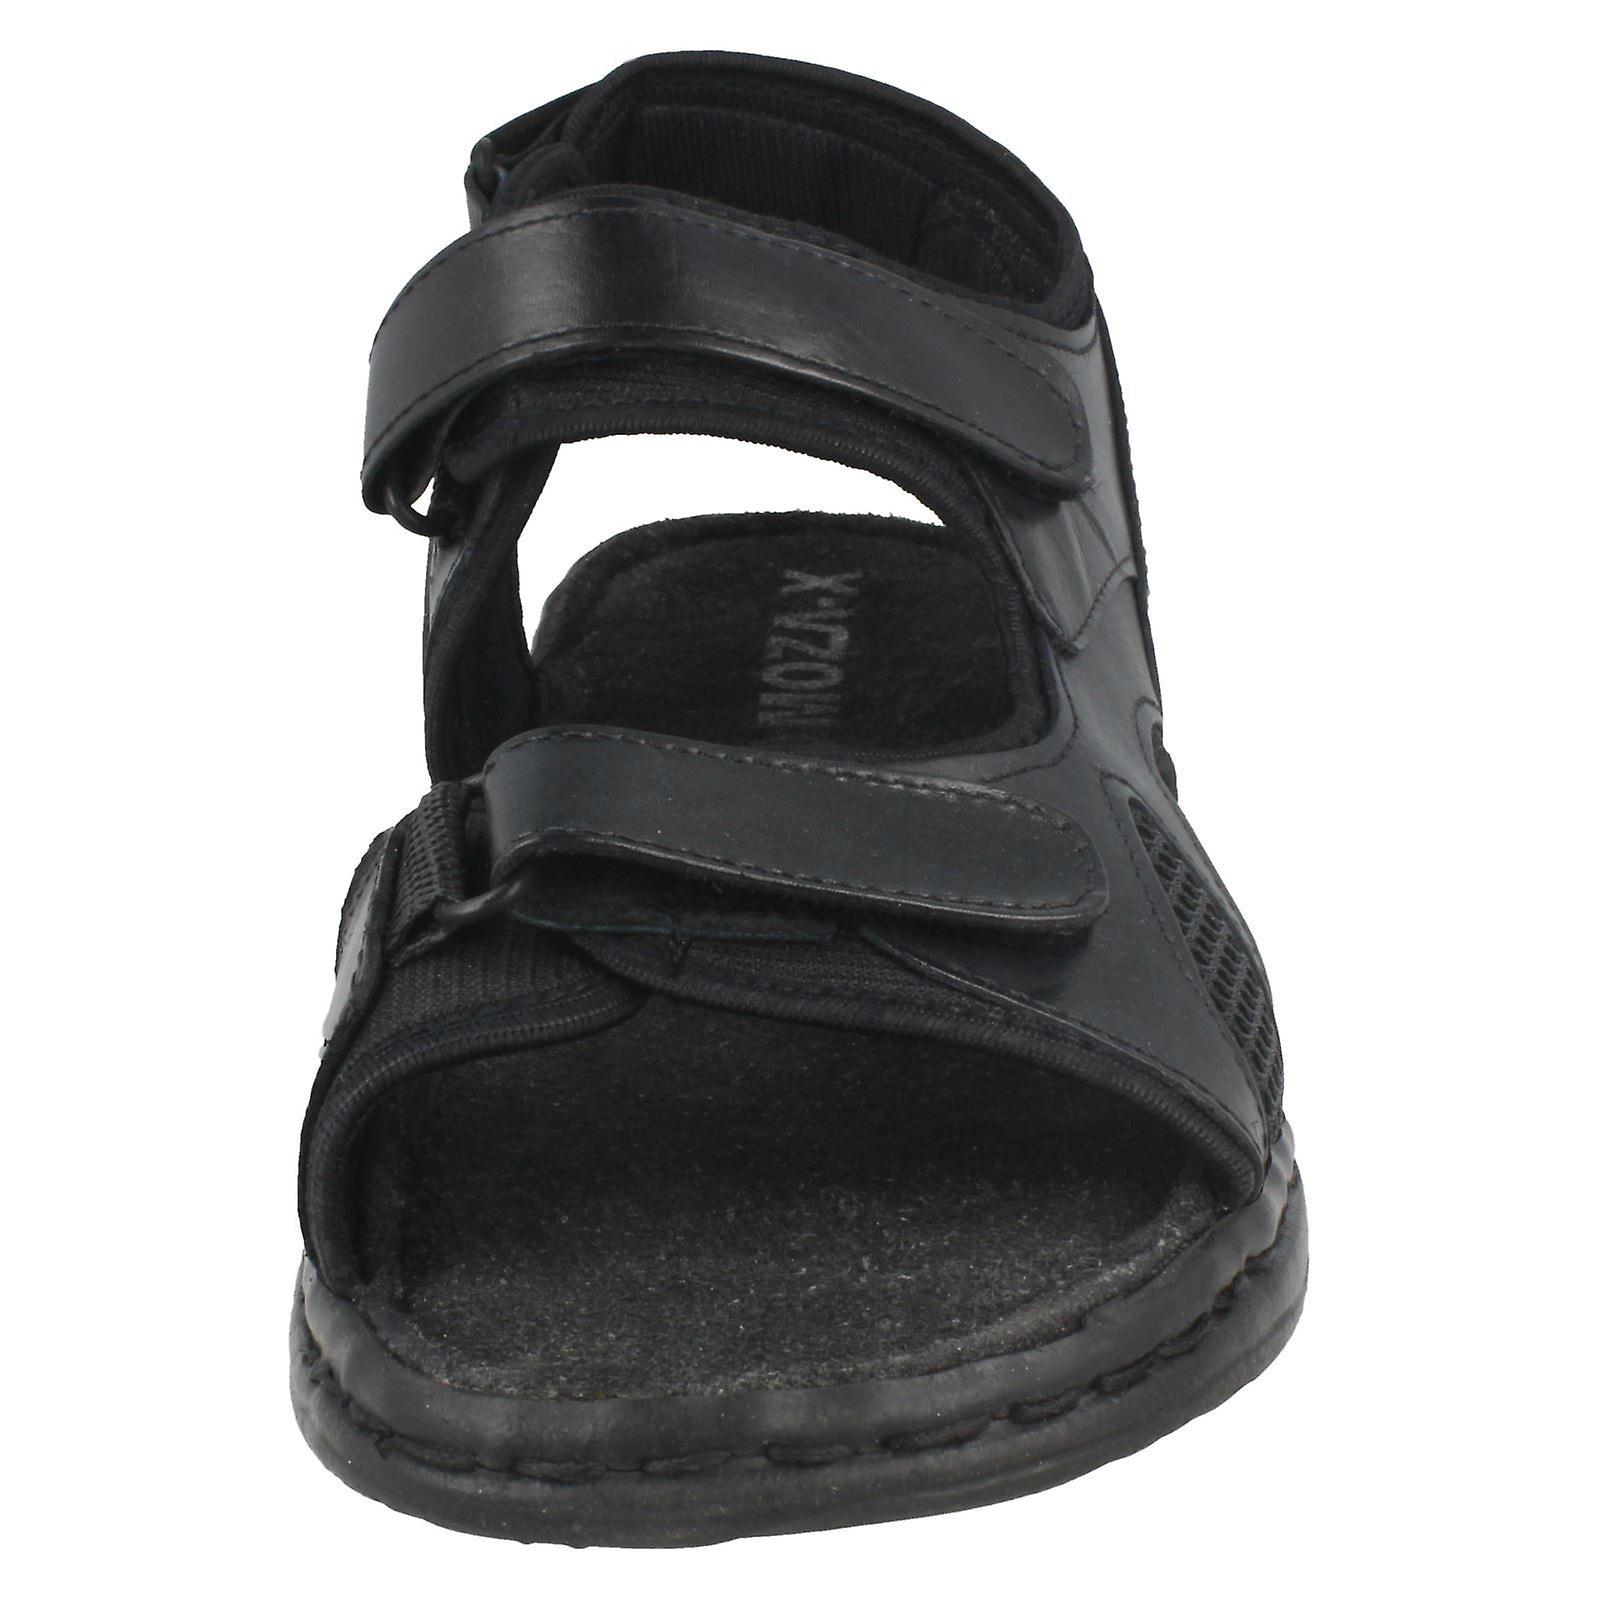 207794 Summer Classic B Moza Mens Sandals X Z0aqOYayt